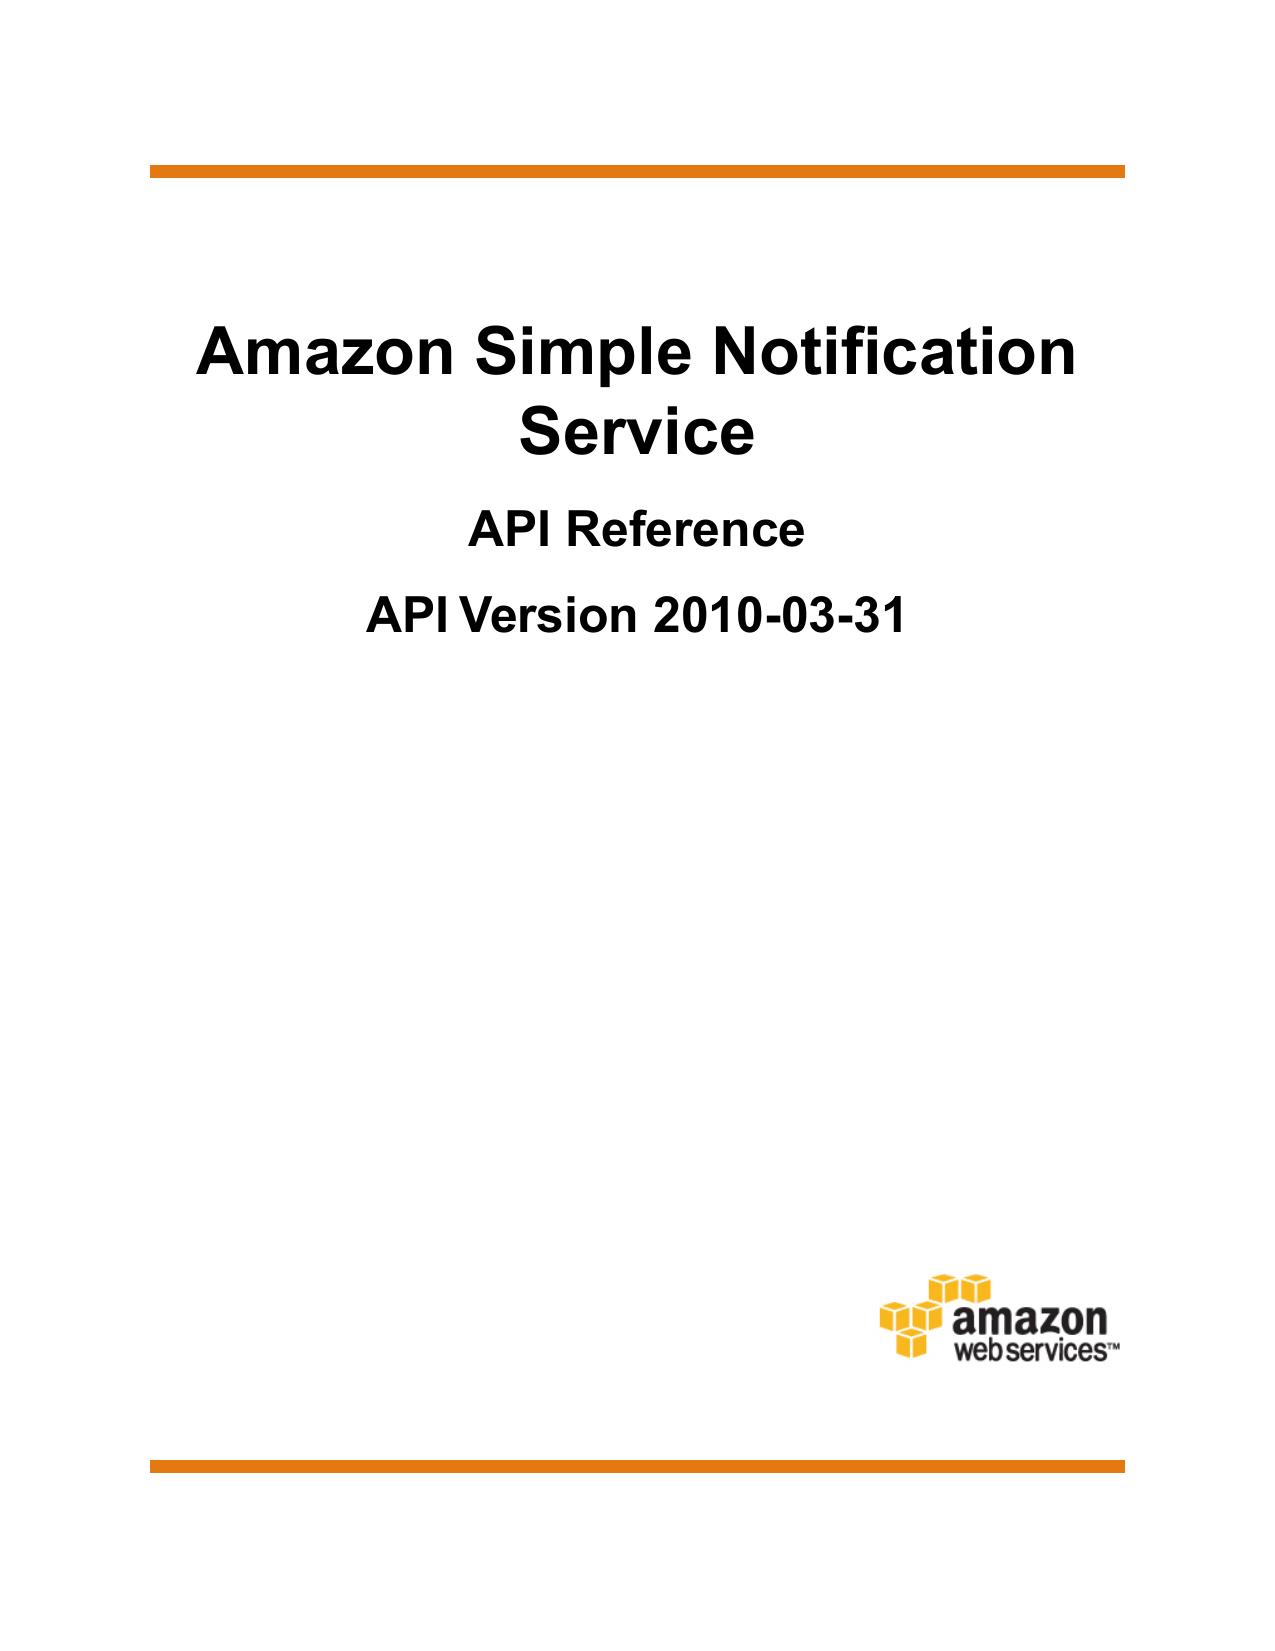 Amazon SNS API - Amazon Web Services | manualzz com